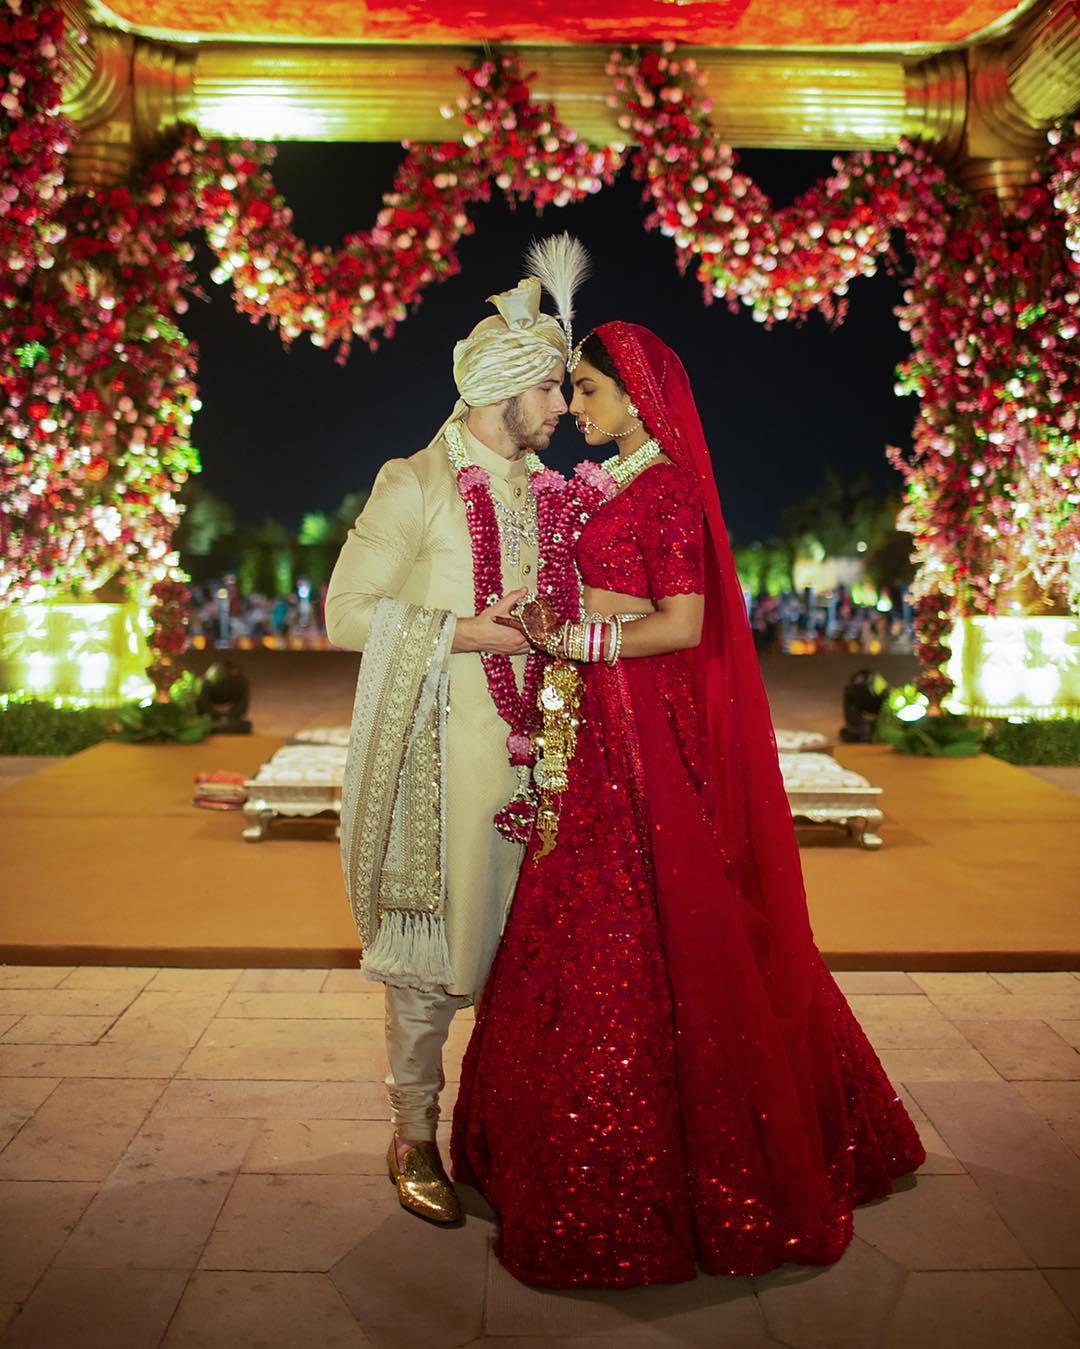 PunjabKesari, Nari, Nickyanka Wedding Image, Priyanka chopra wedding lehenga